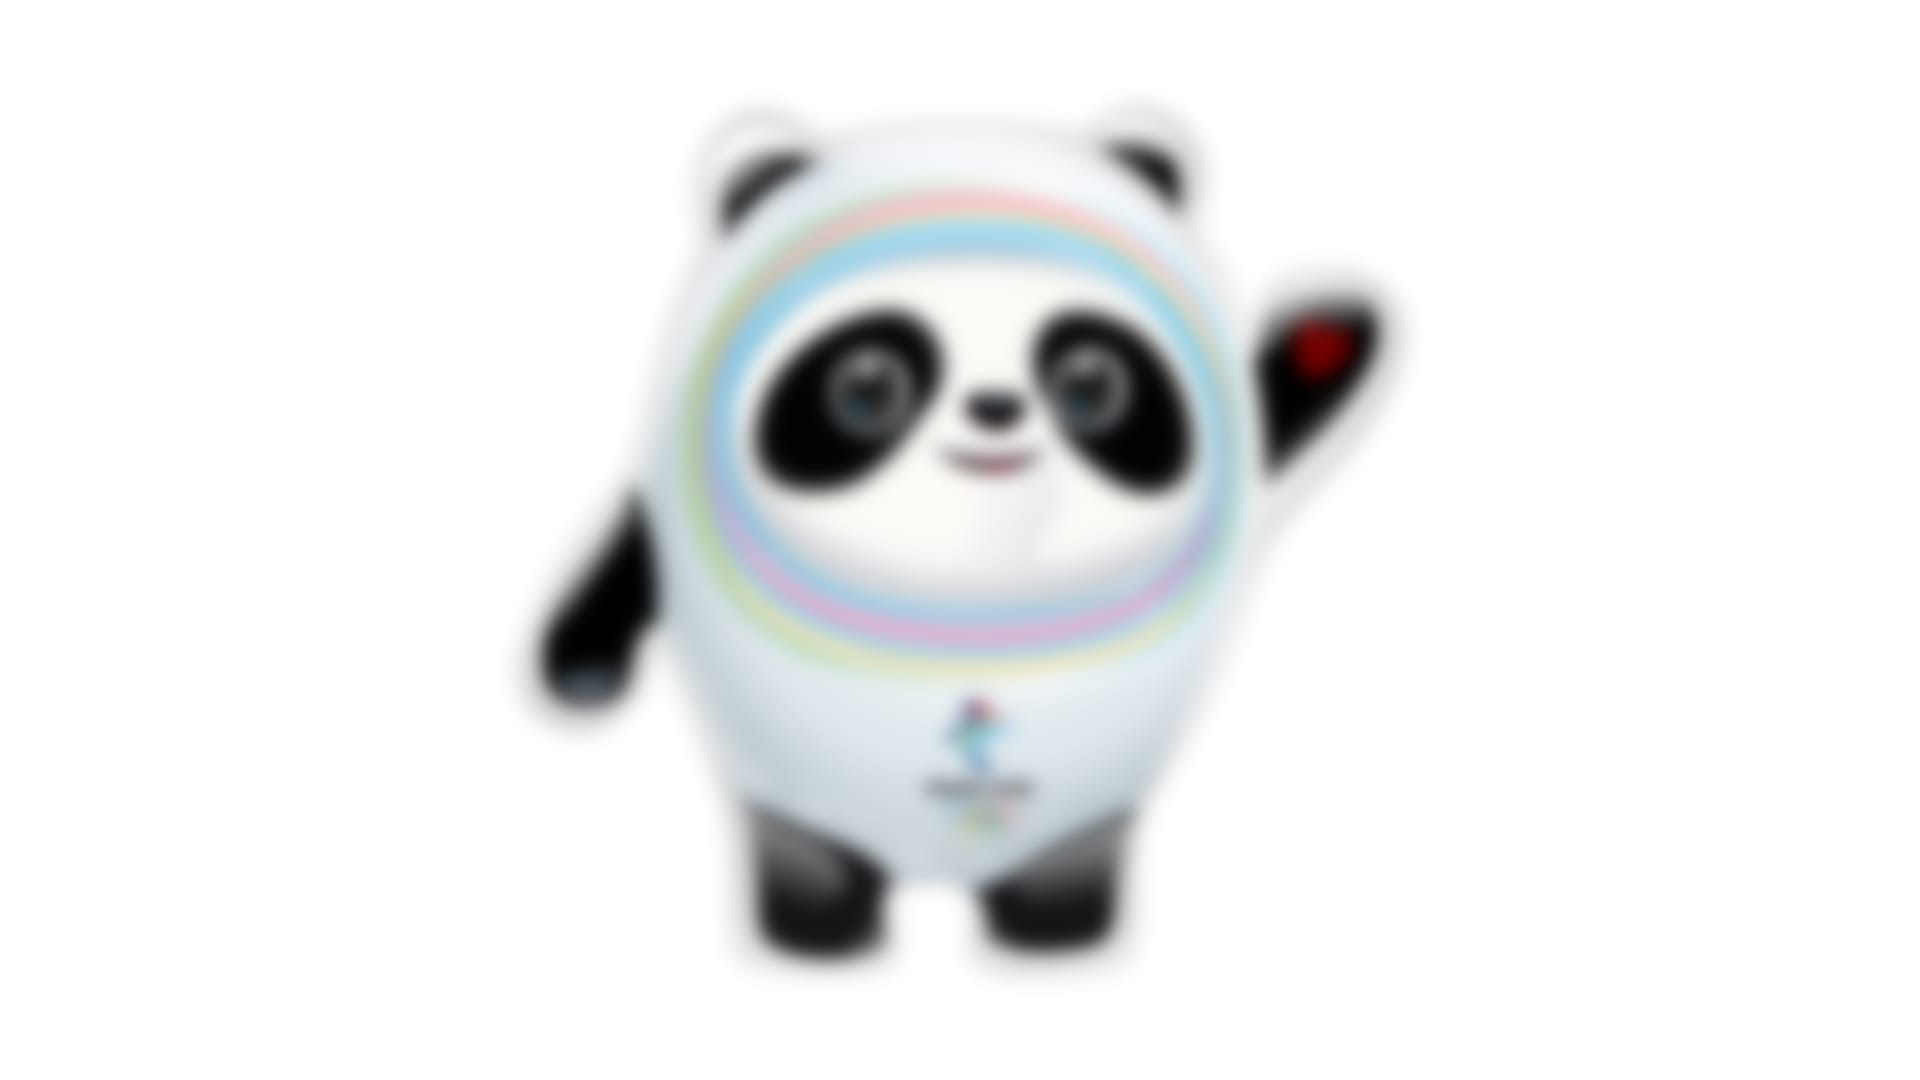 Beijing 2022 Winter Olympic Games Mascot Bing Dwen Dwen